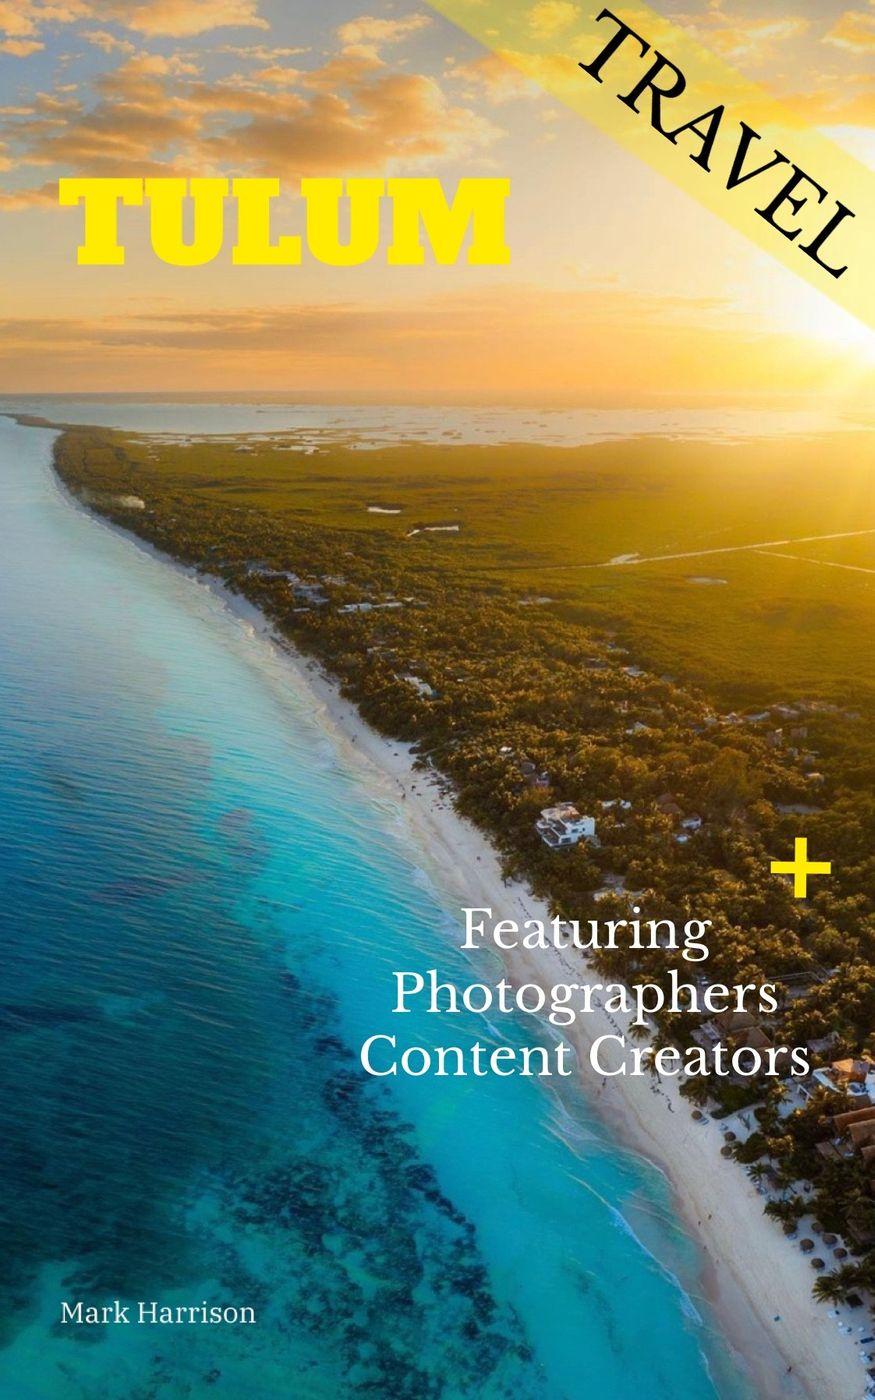 Featuring Content Creators and Photographers | Tulum 🇲🇽